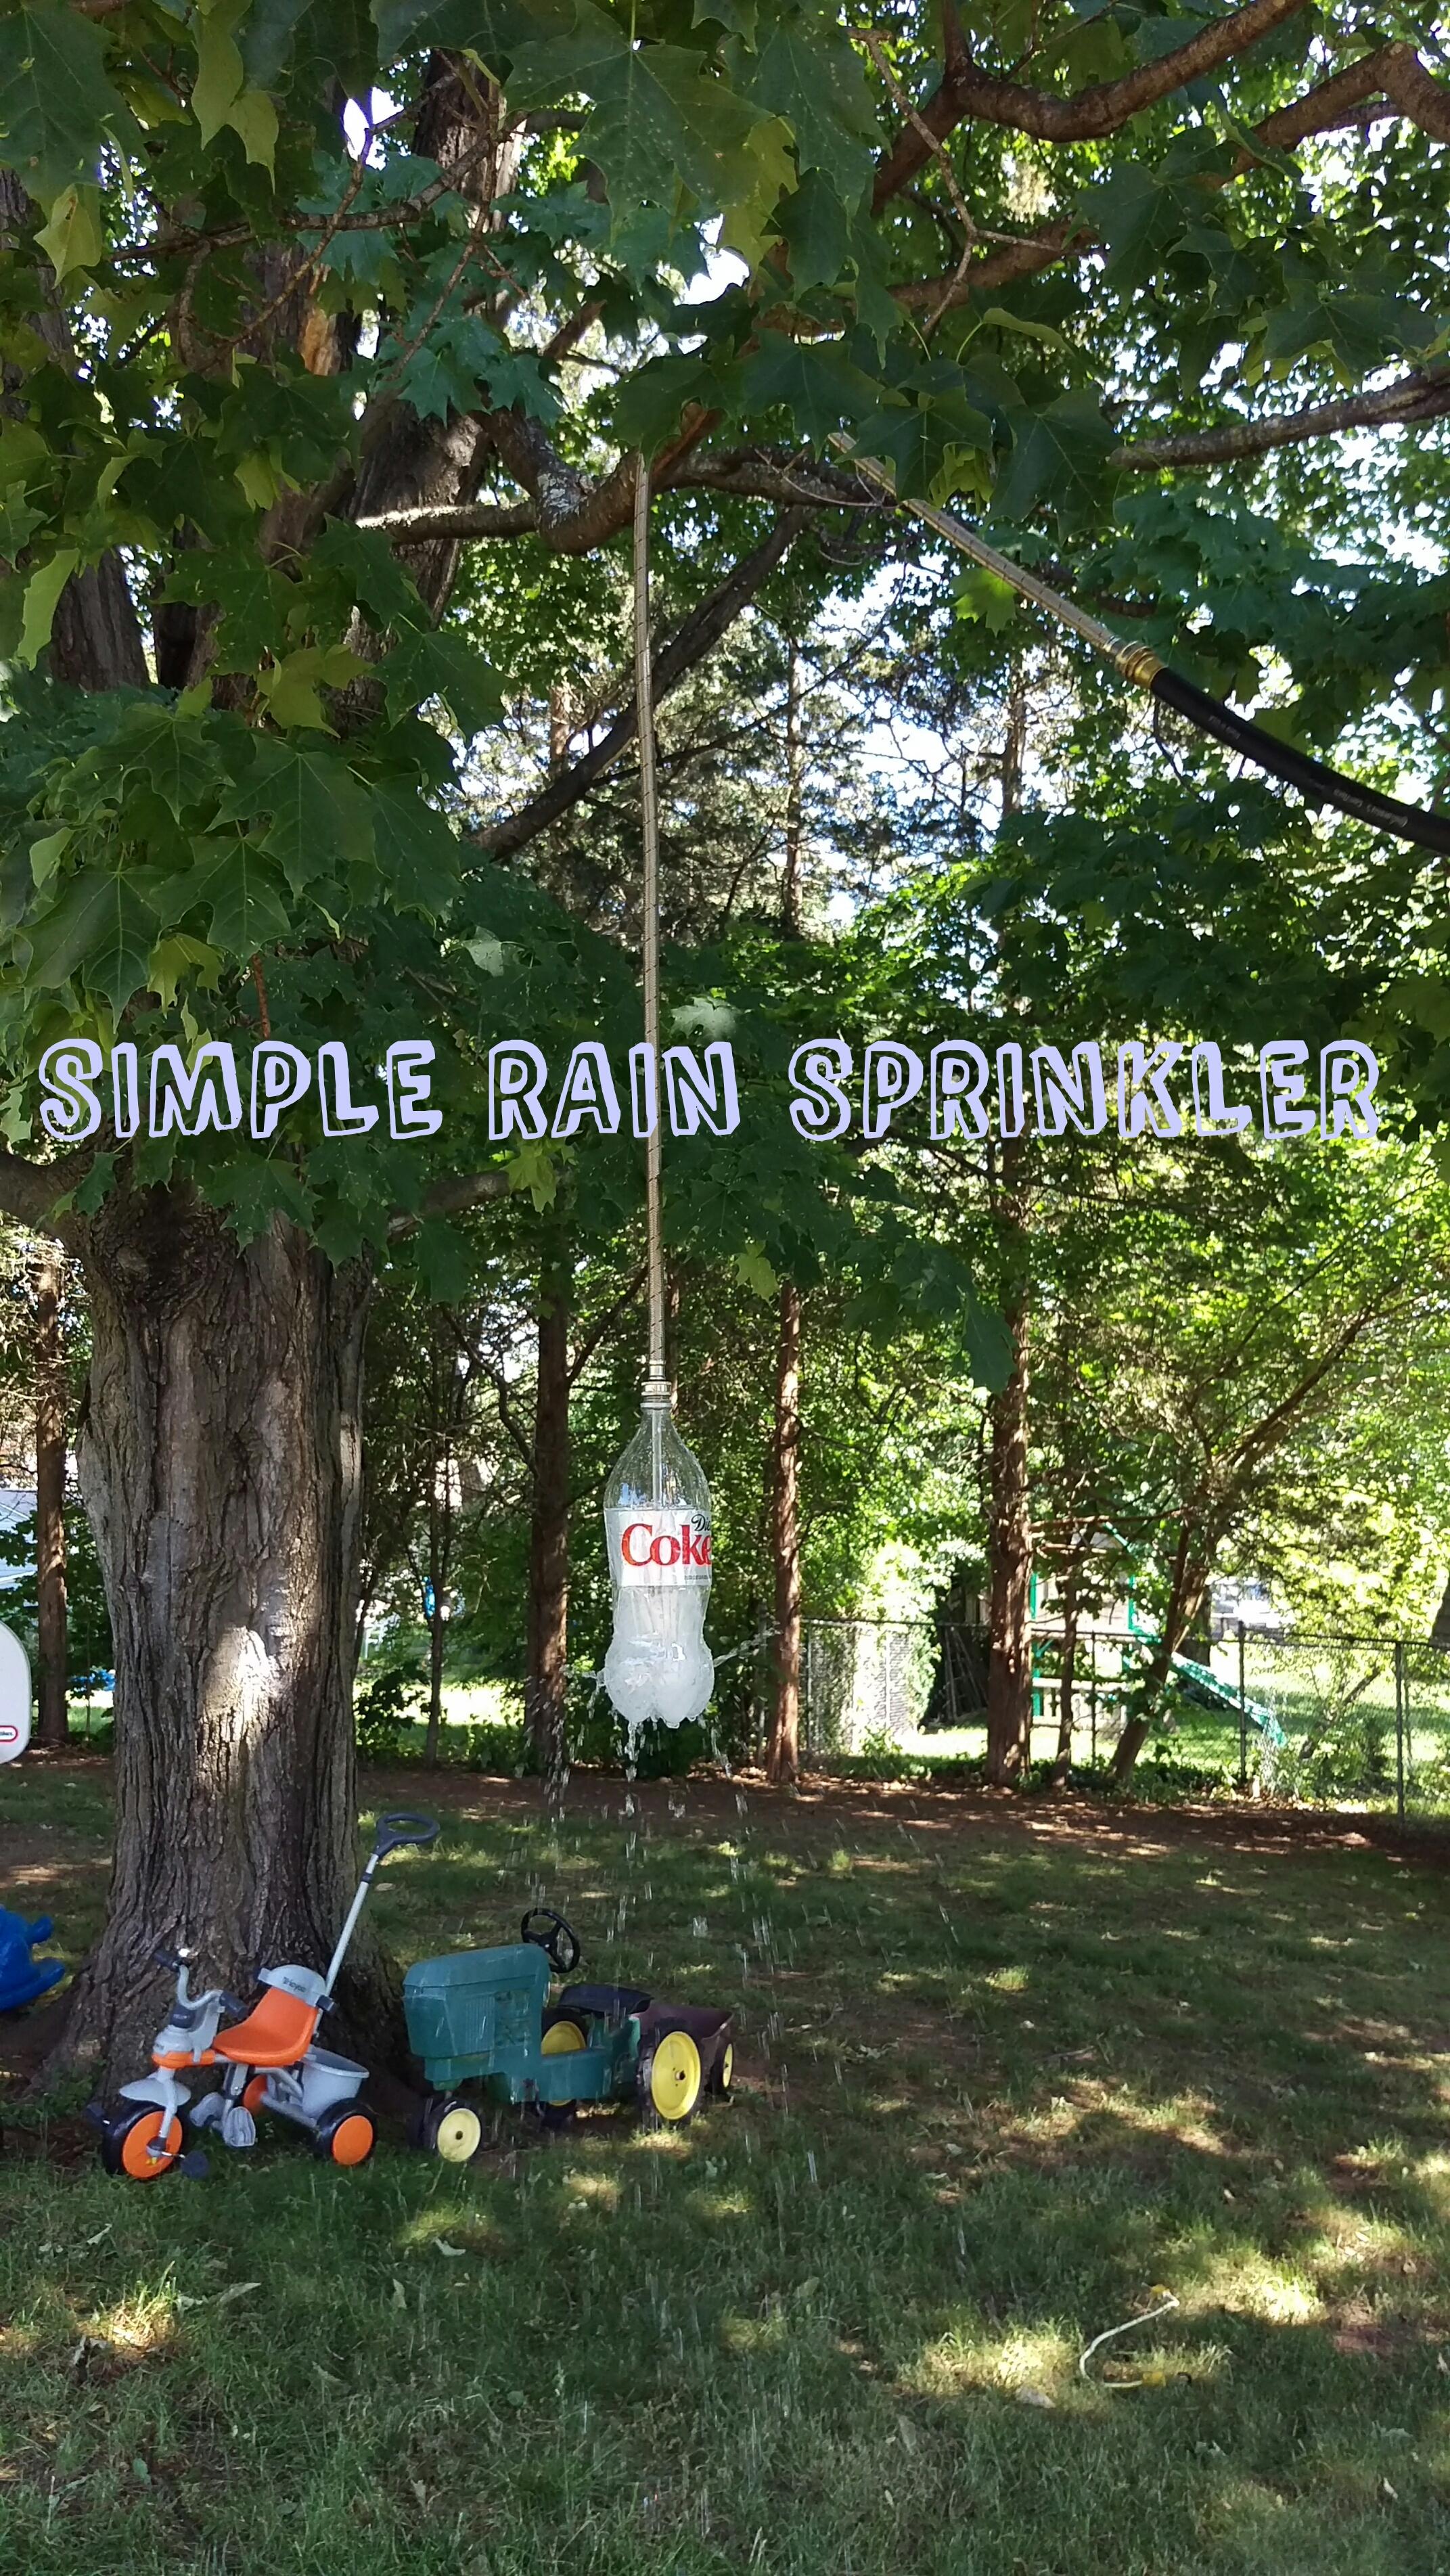 Simple Rain Sprinkler